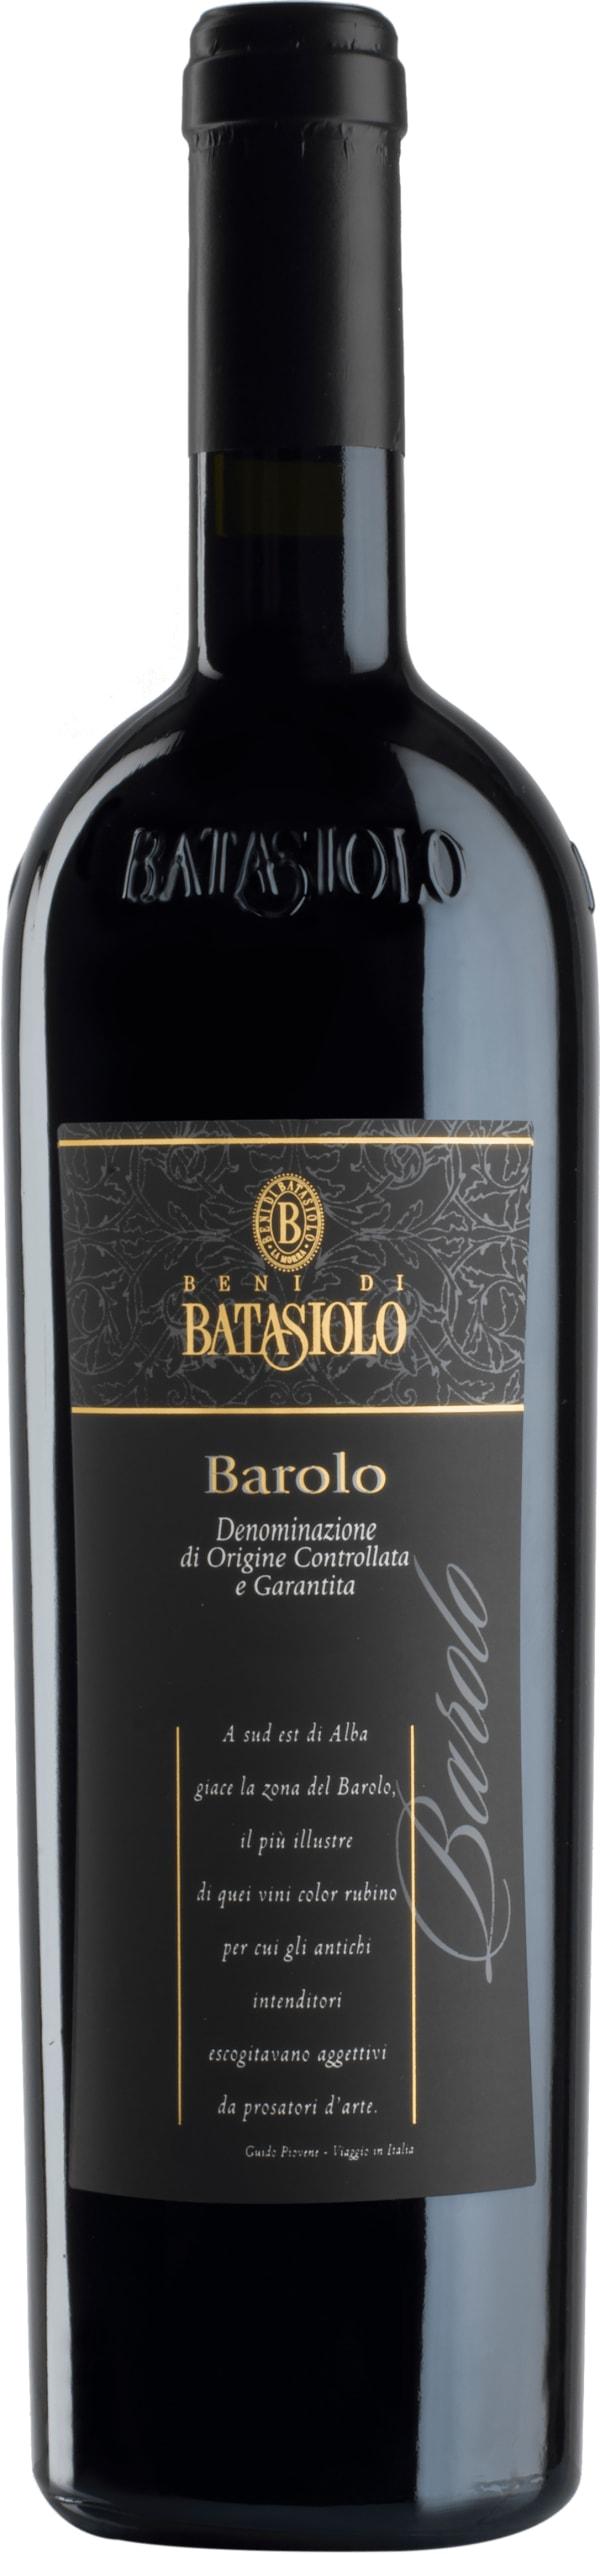 Barolo Batasiolo 2015